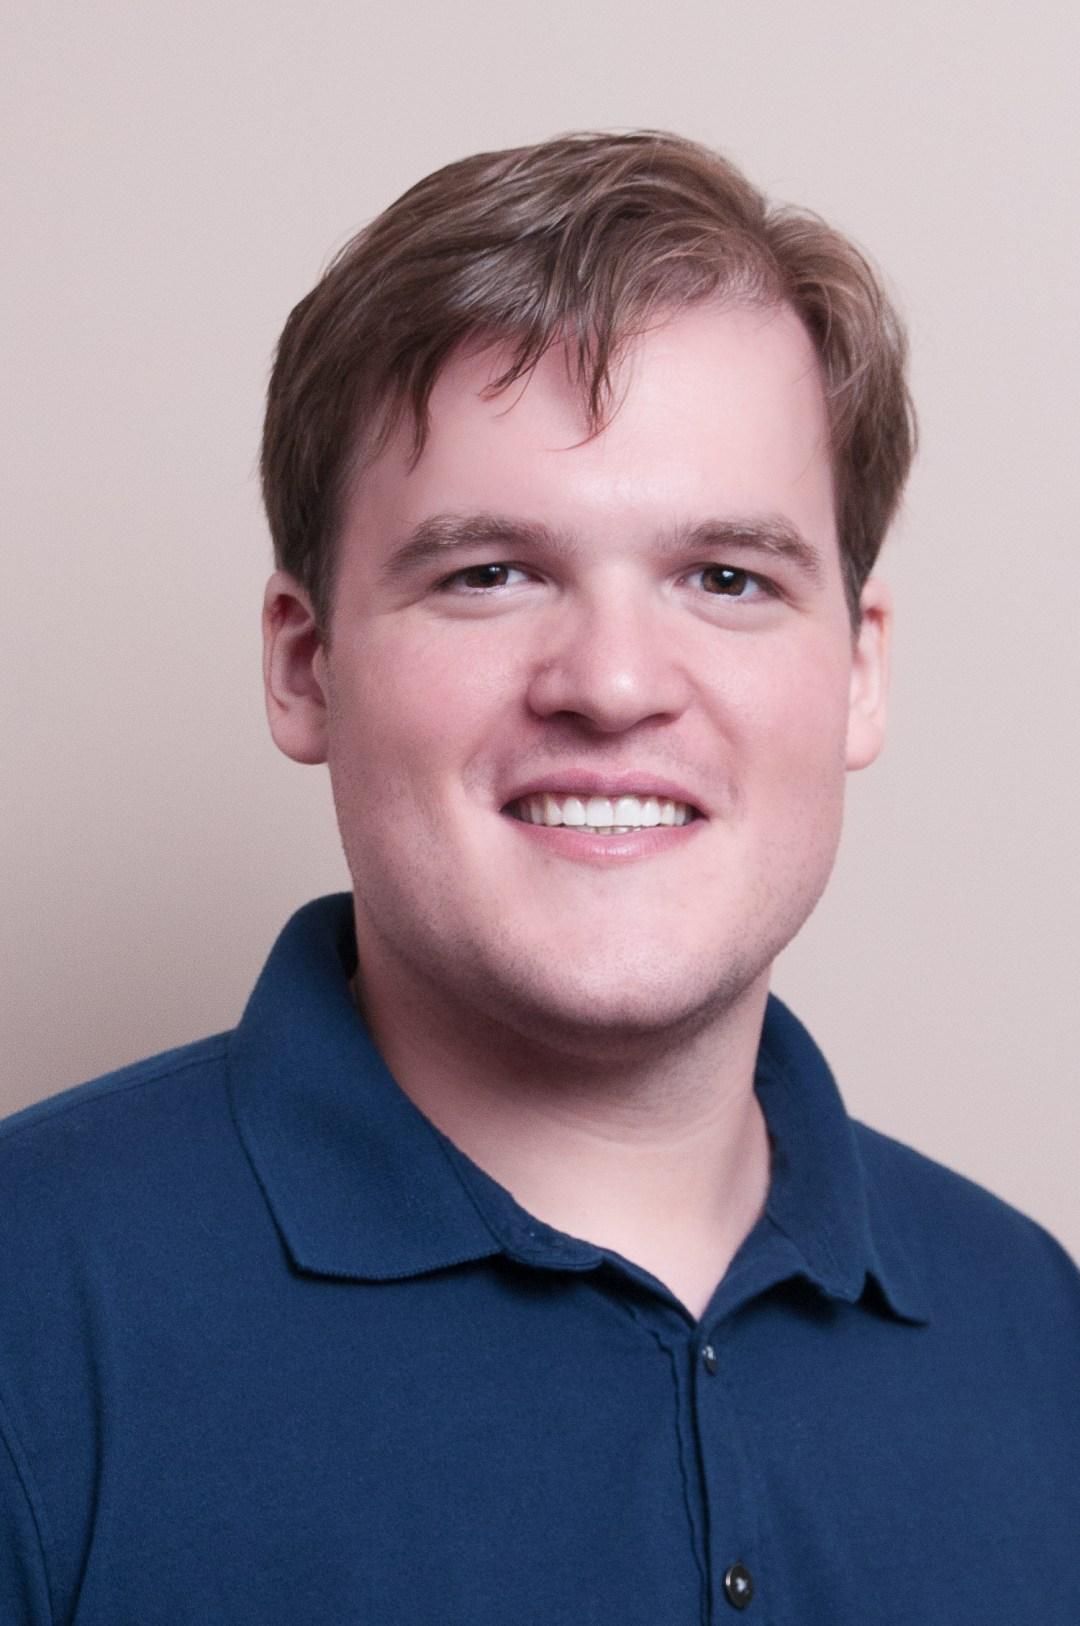 Robert Kraft, Licensed Massage Therapist at Simsbury Therapeutic Massage & Wellness